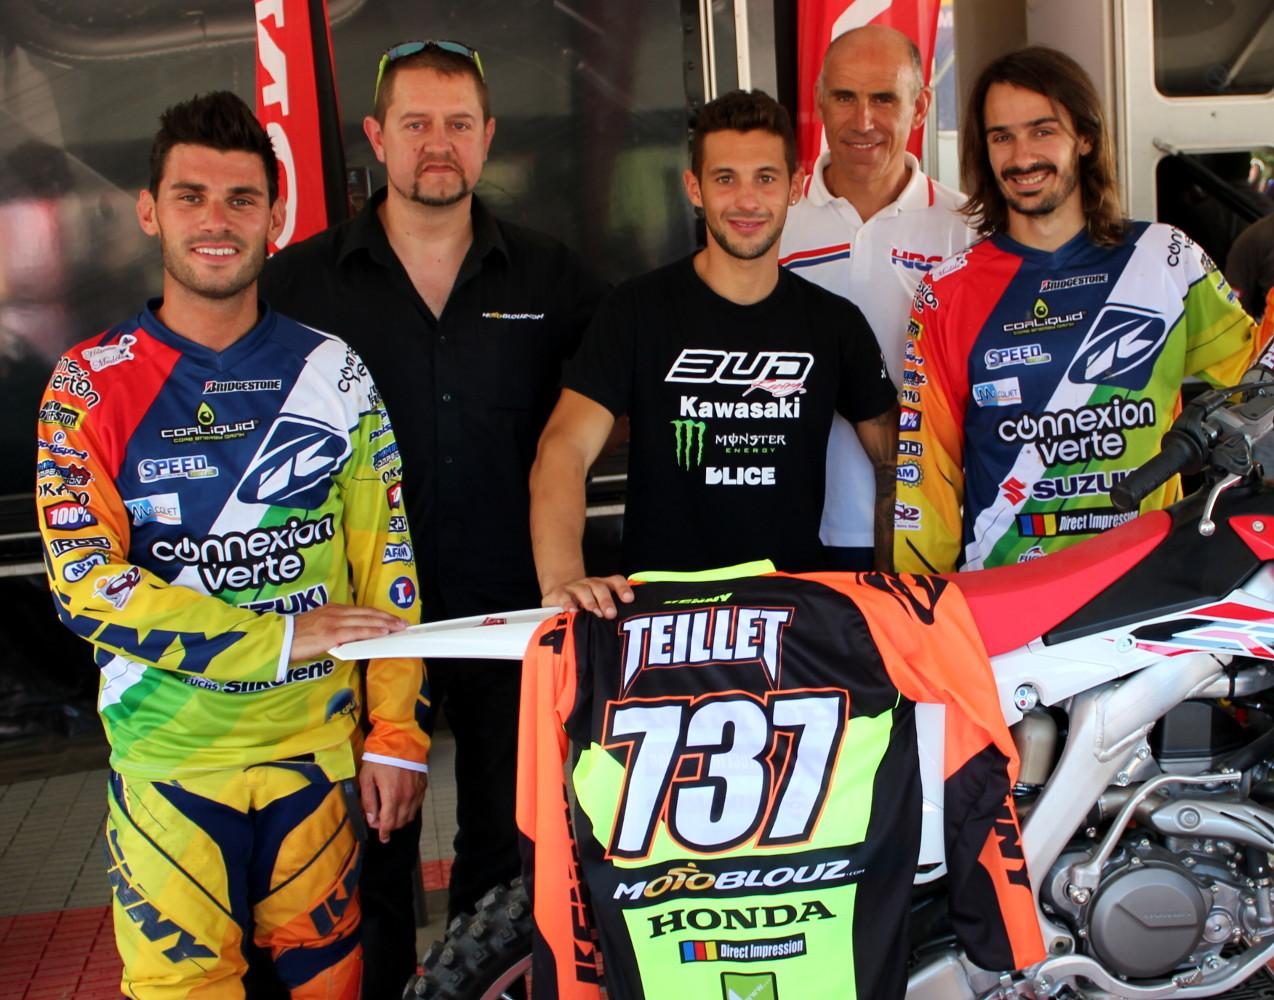 Team SR Motoblouz : Avec Valentin Teillet !